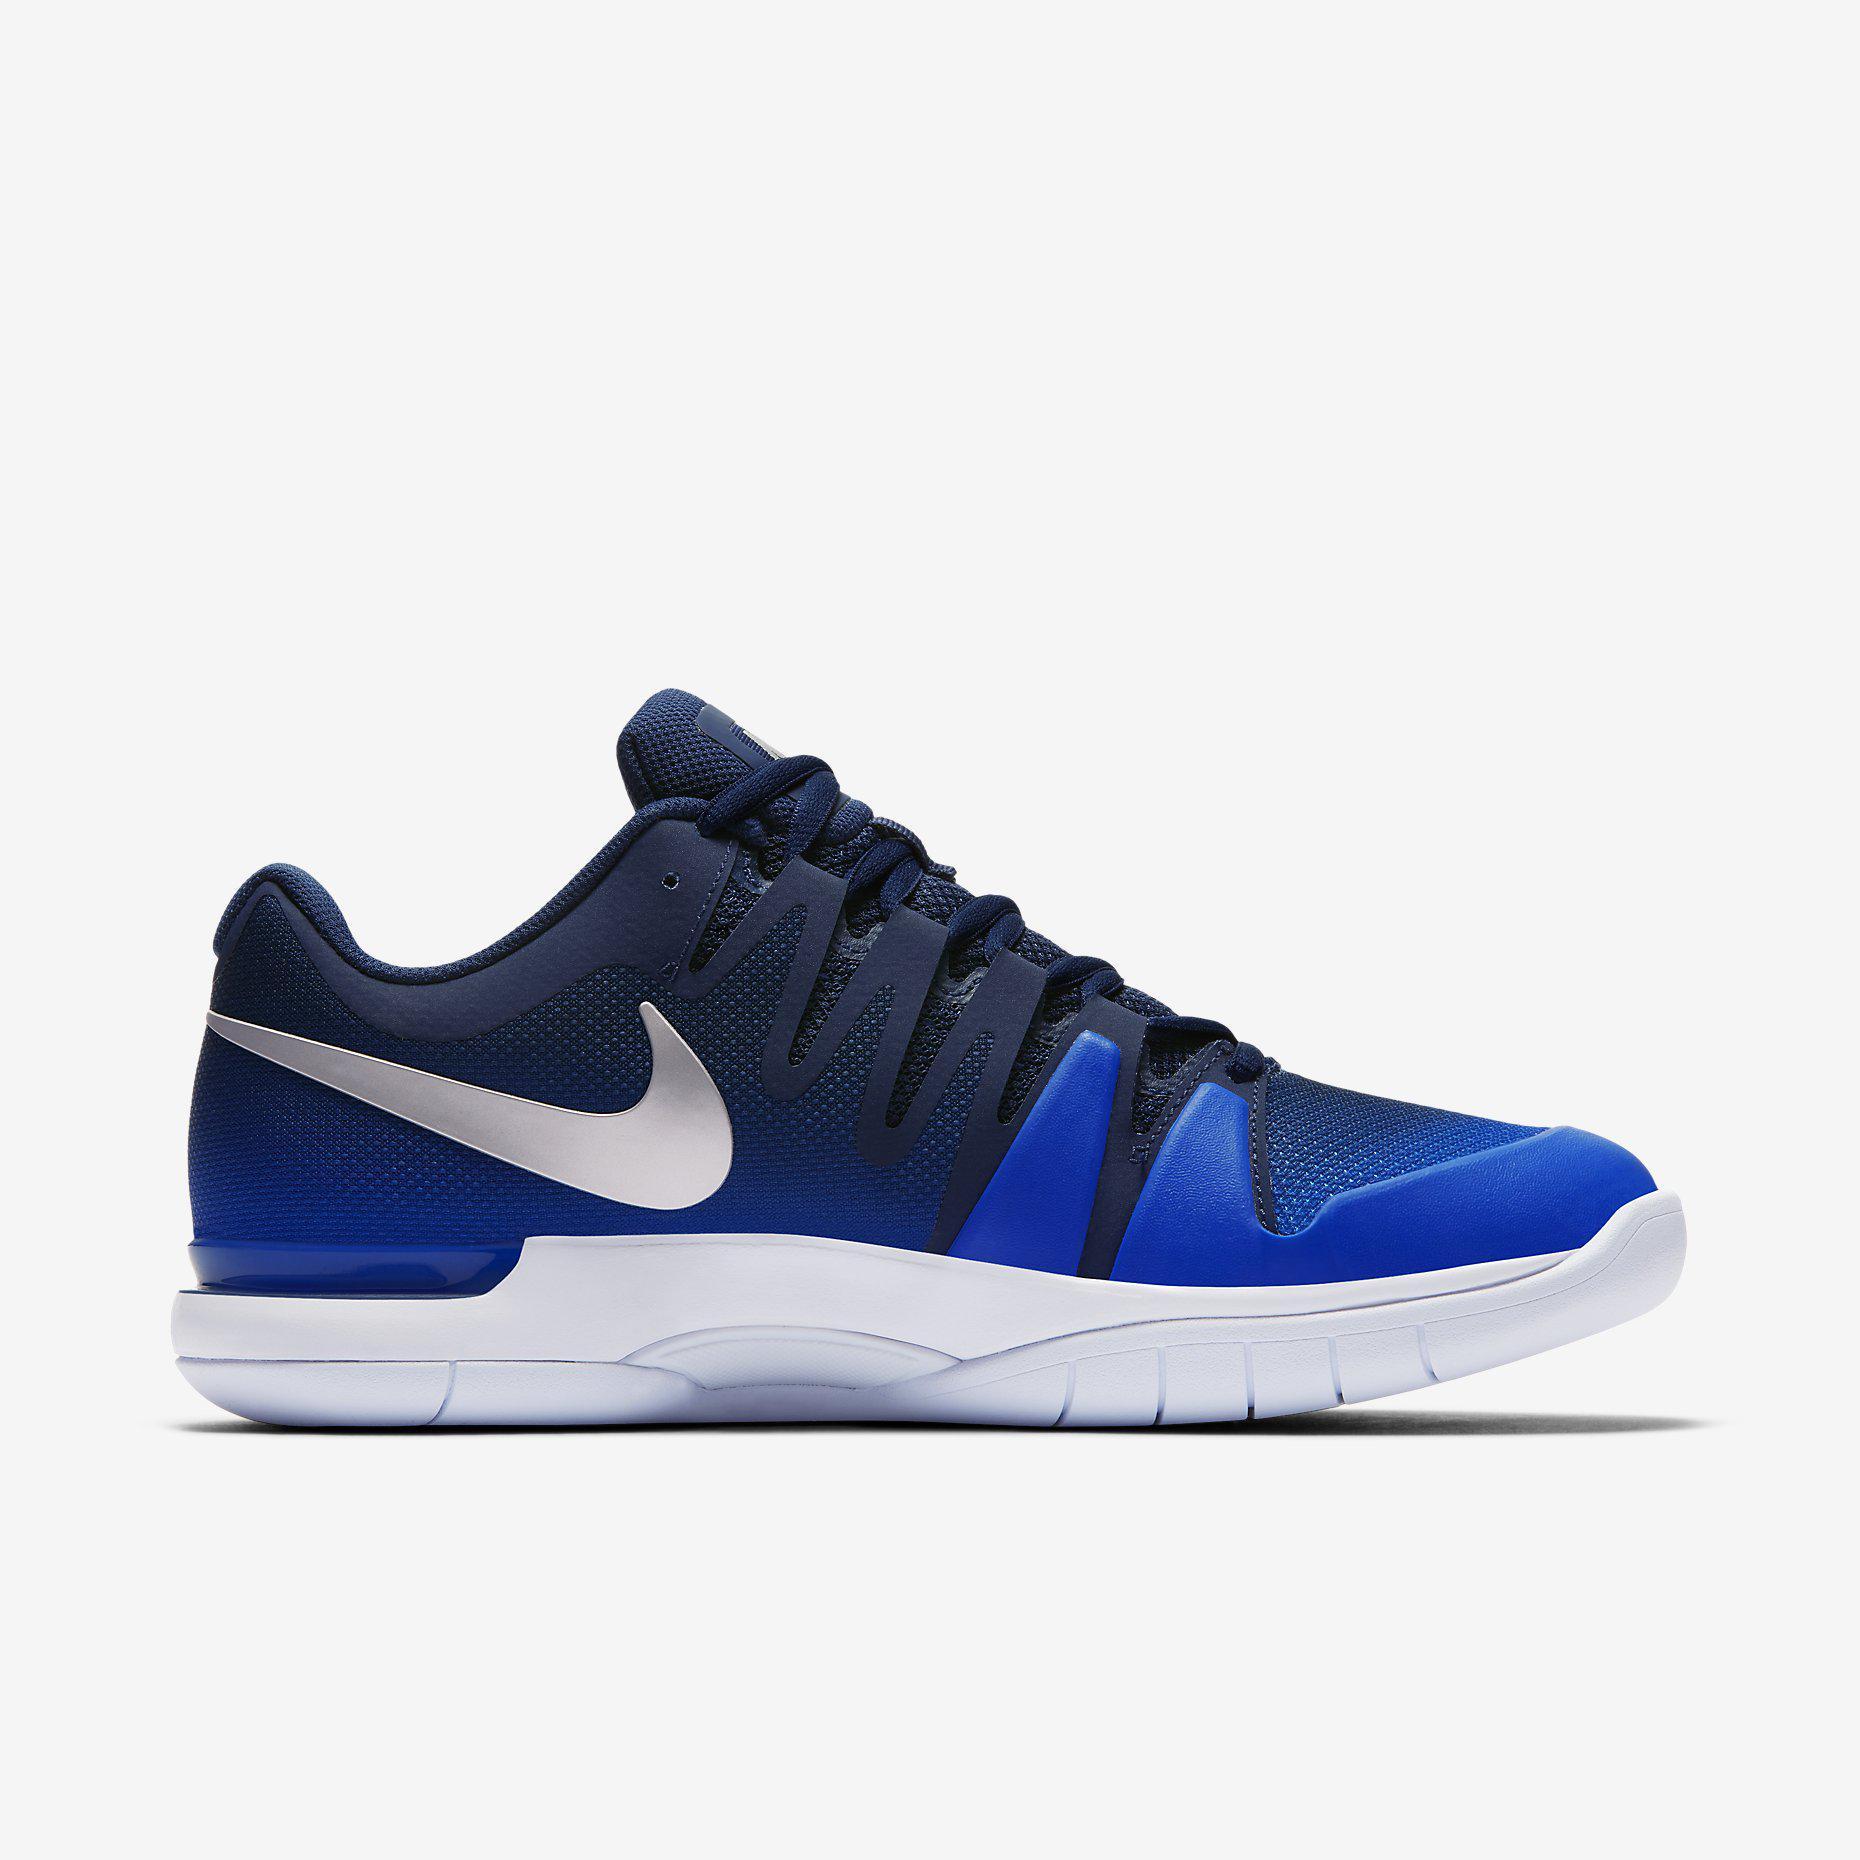 2eba1f0bf09b9 Nike Mens Court Zoom Vapor 9.5 Tour Carpet Tennis Shoes - Midnight Navy Metallic  Silver